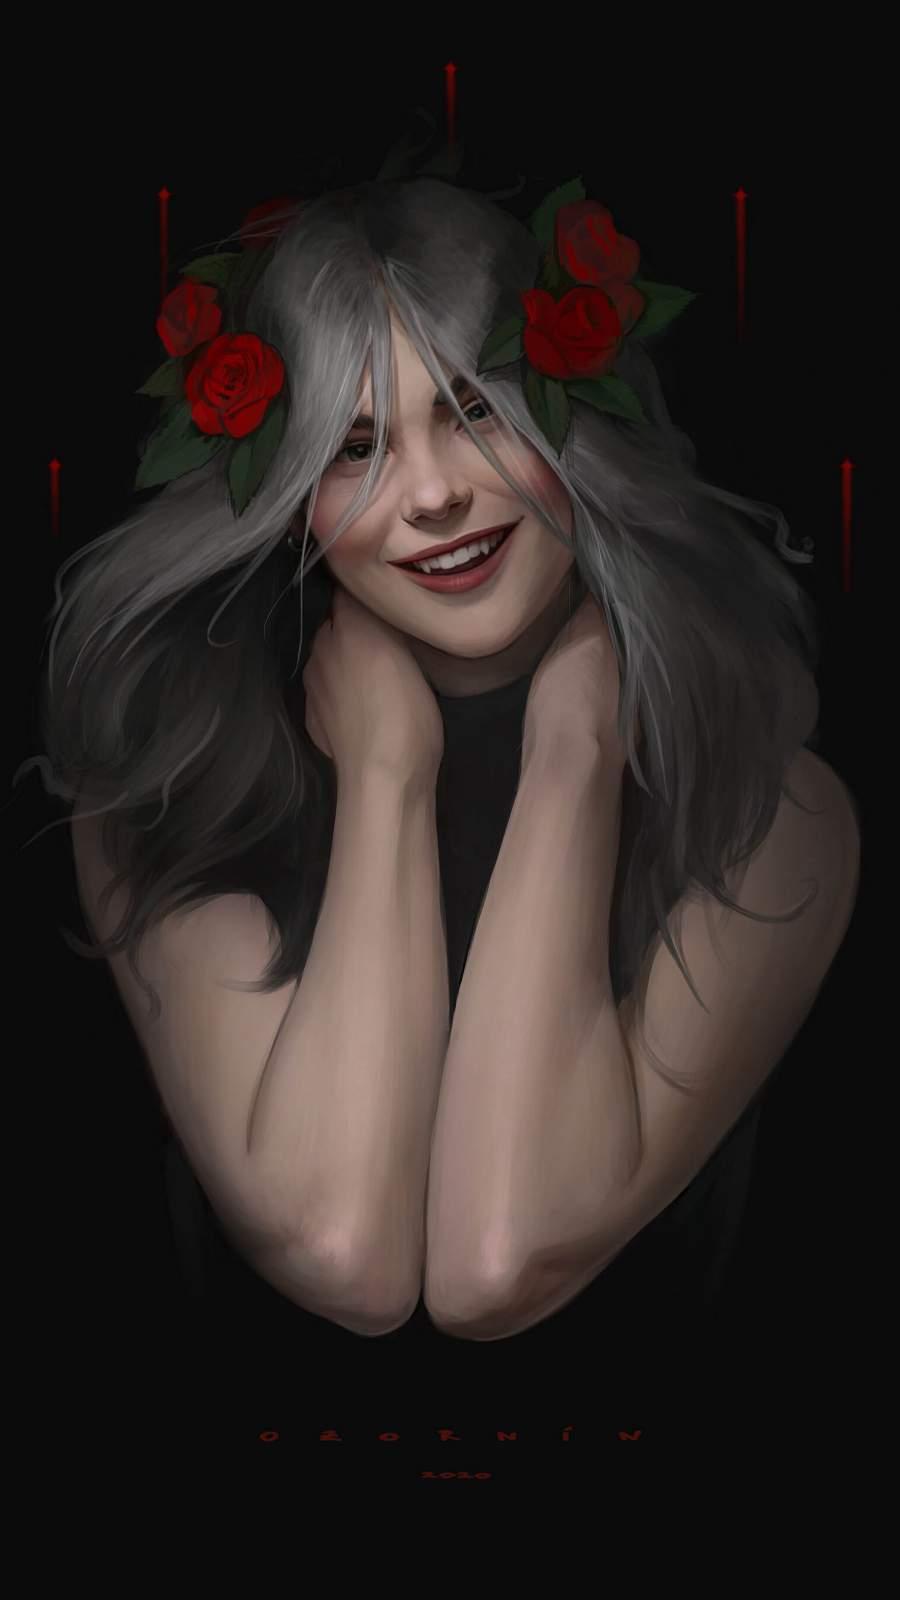 Vampire Girl iPhone Wallpaper